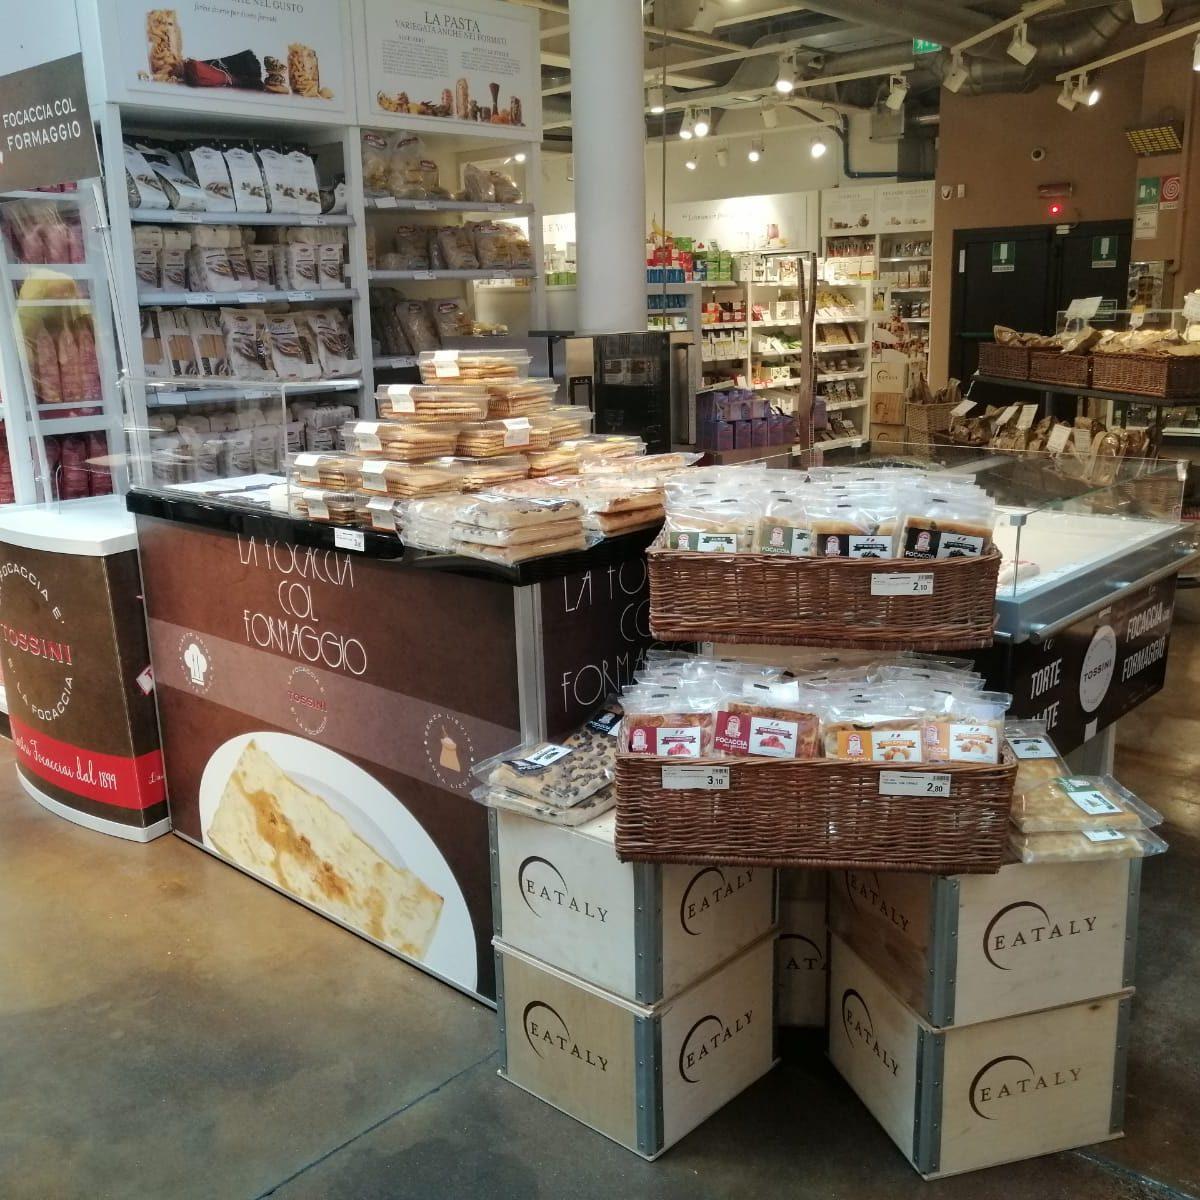 Corner Tossini -Eataly Store Milano Smeraldo (12)